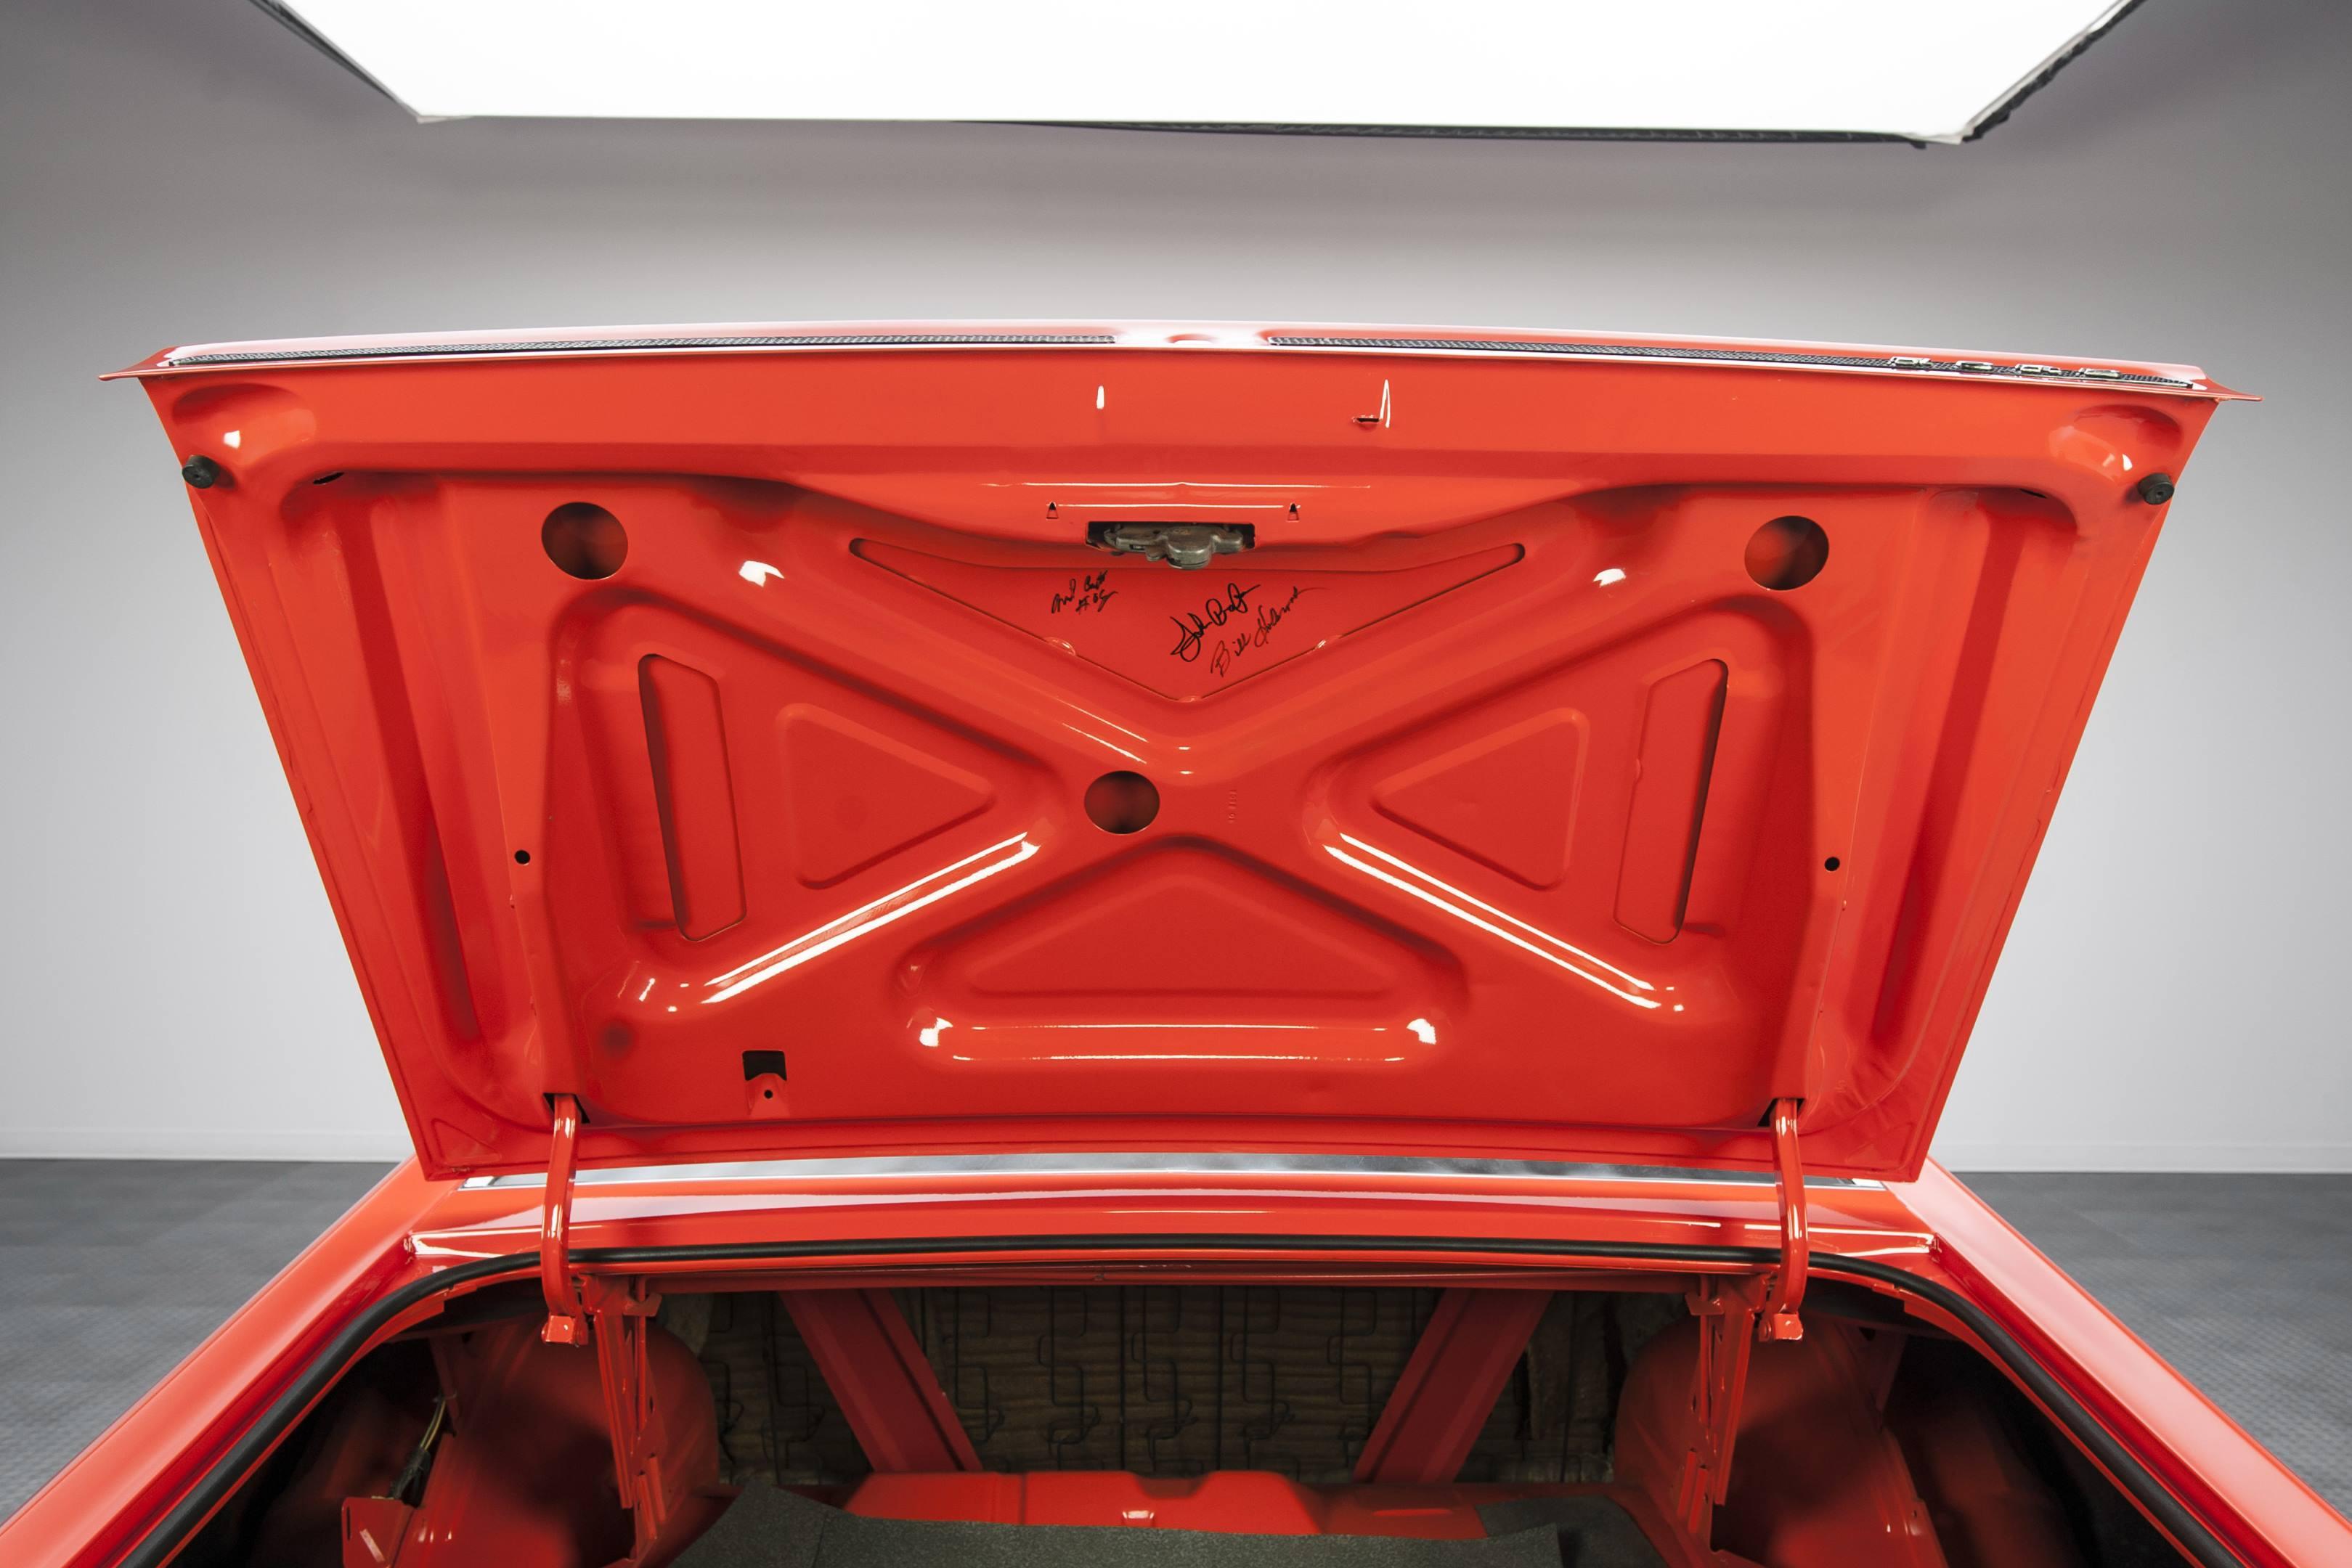 Ford Torino King Cobra trunk